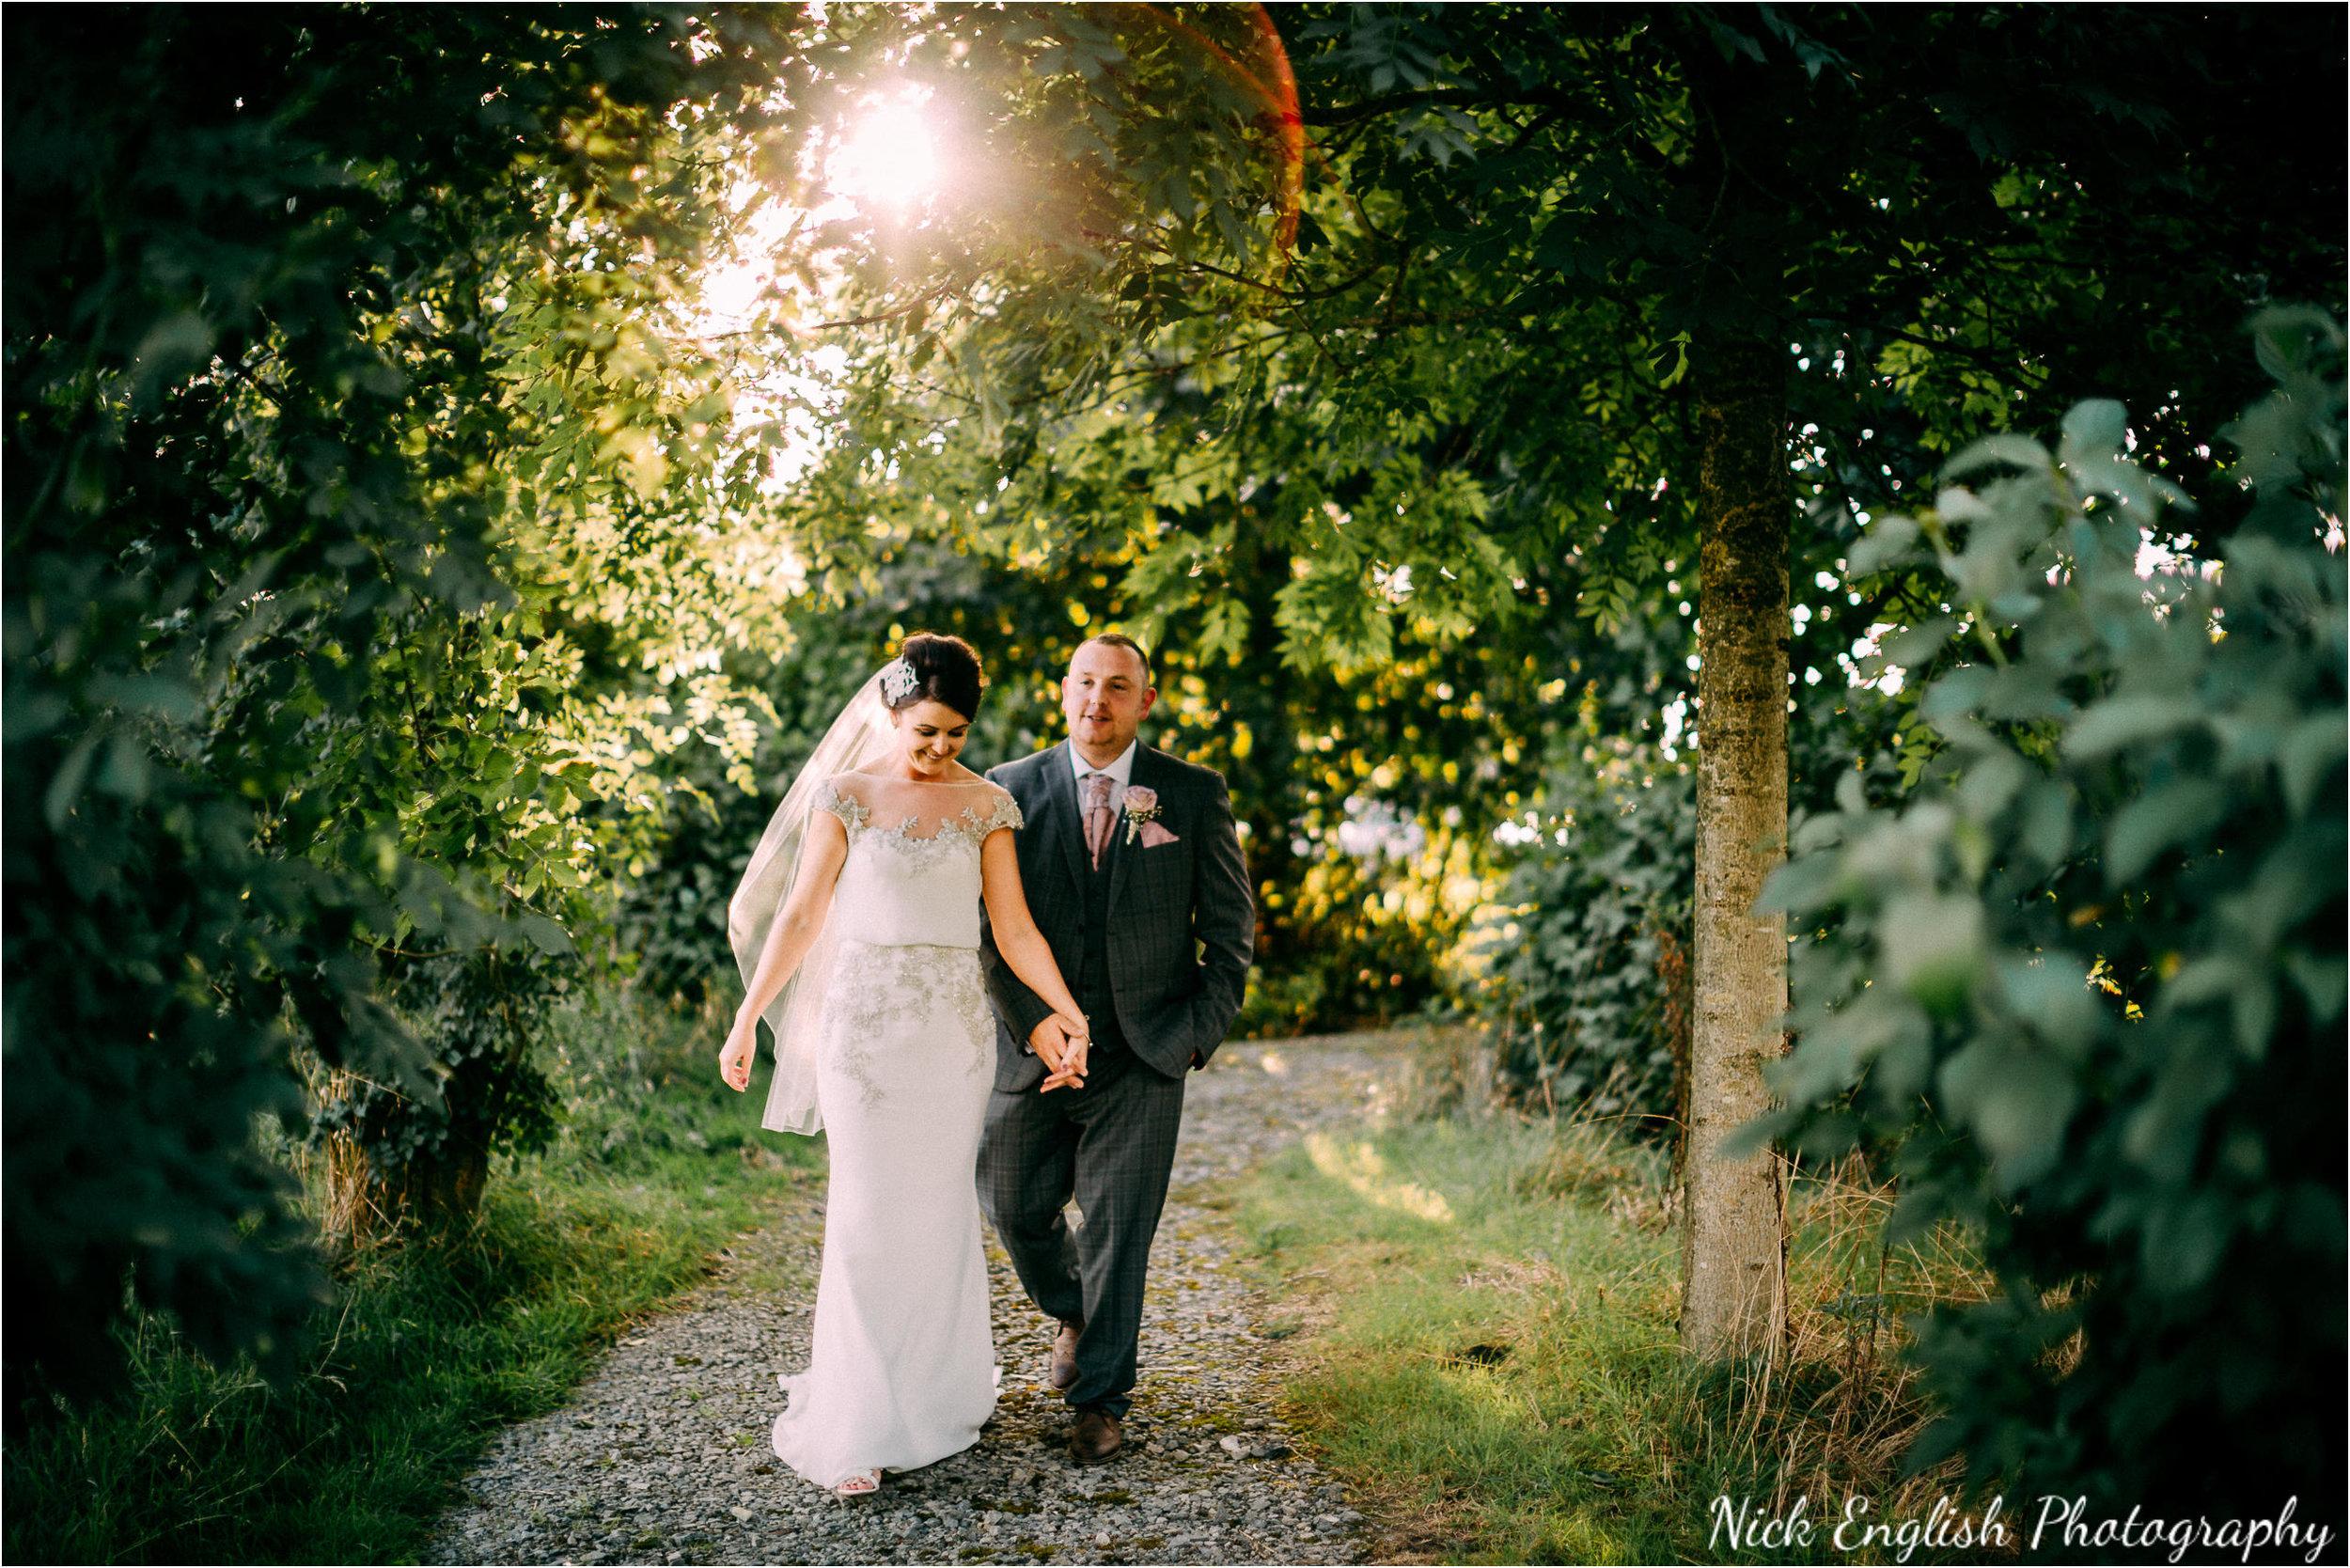 Stacey-Ash-Wedding-Photographs-Stanley-House-Preston-Lancashire-208.jpg